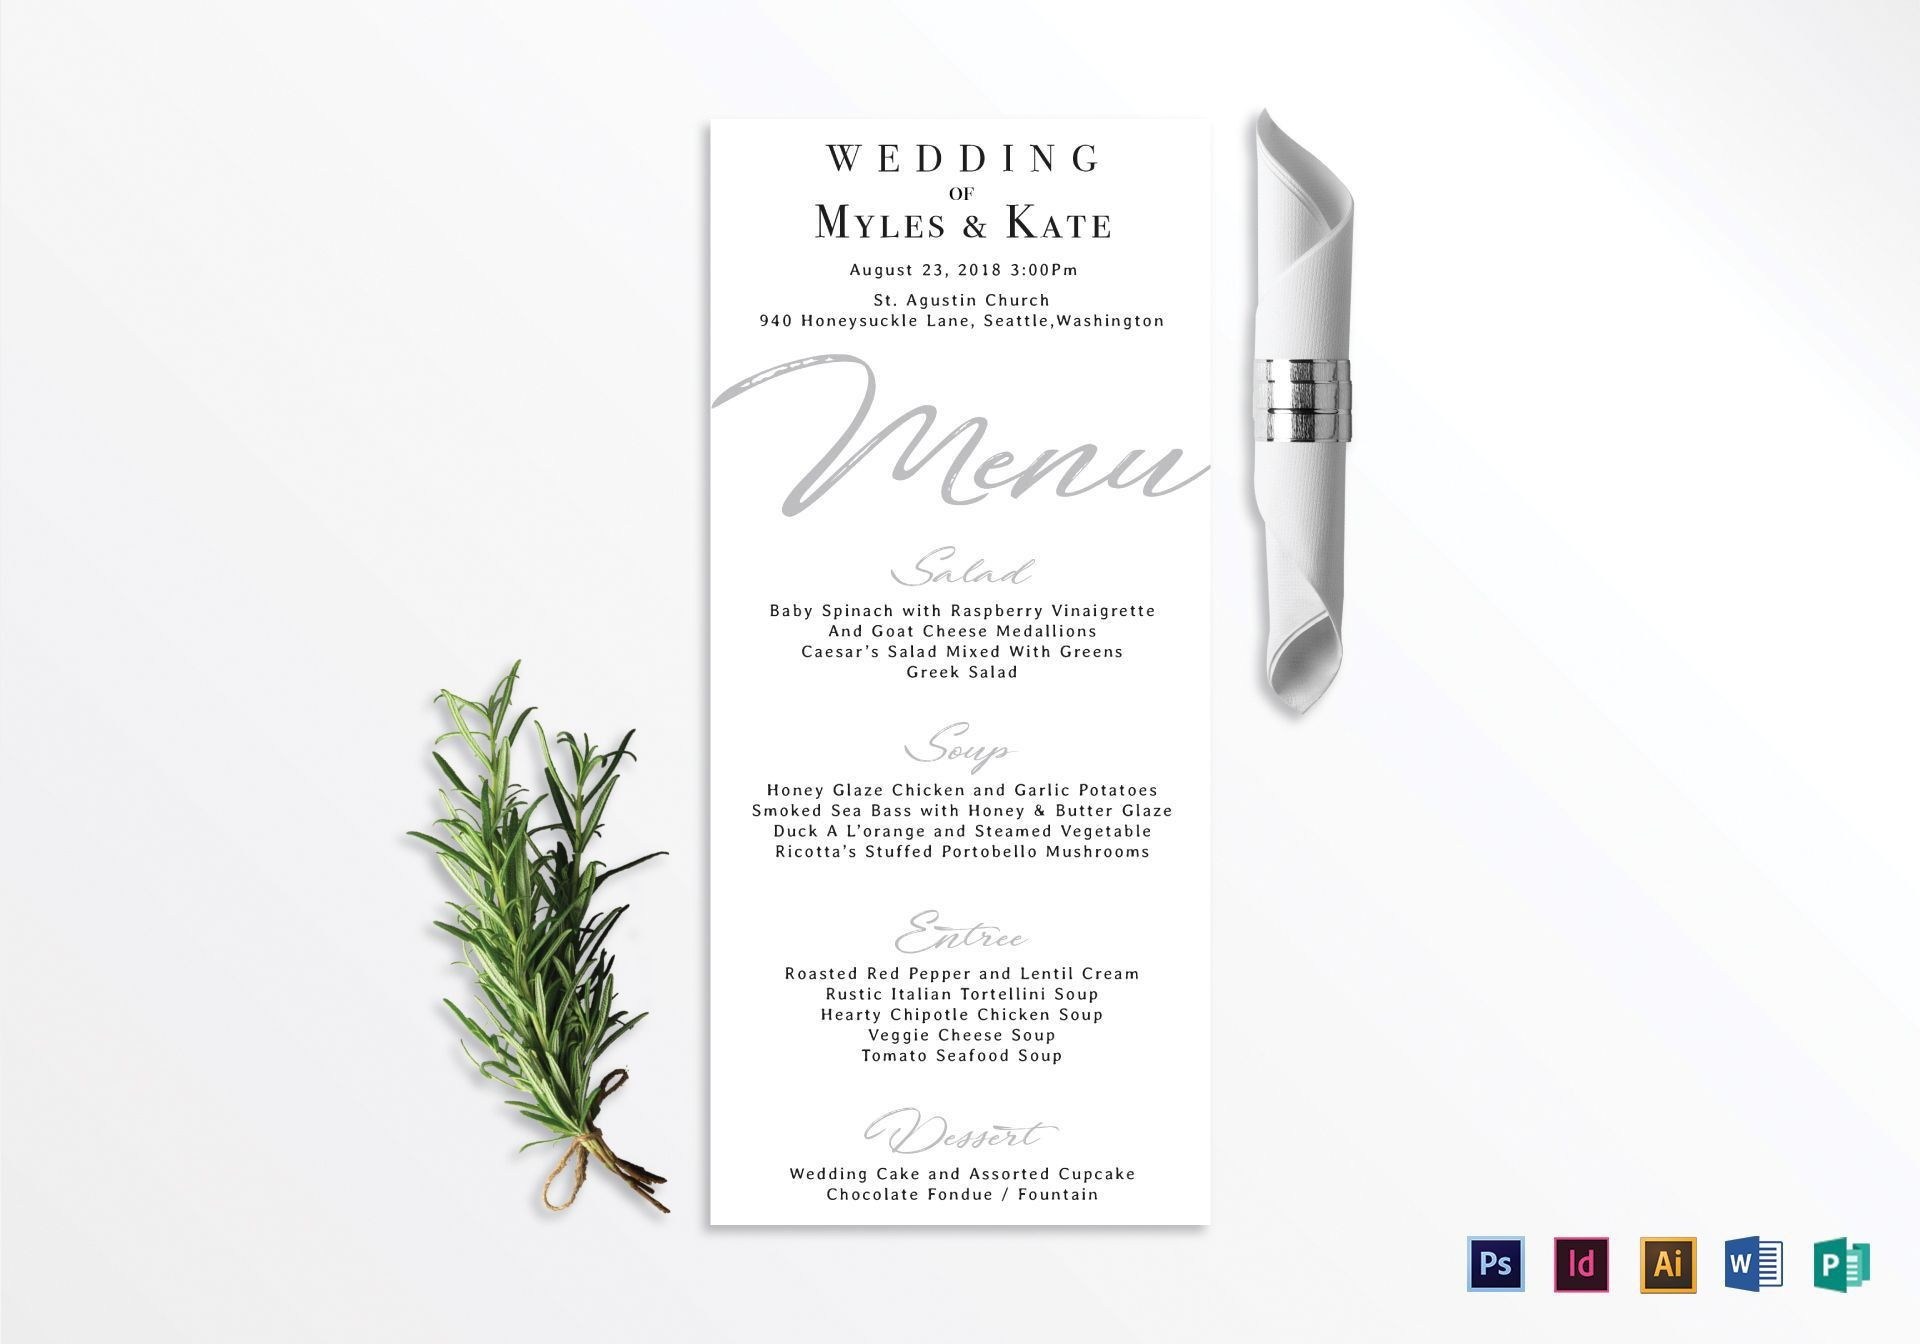 002 Incredible Wedding Menu Card Template Word Example Full